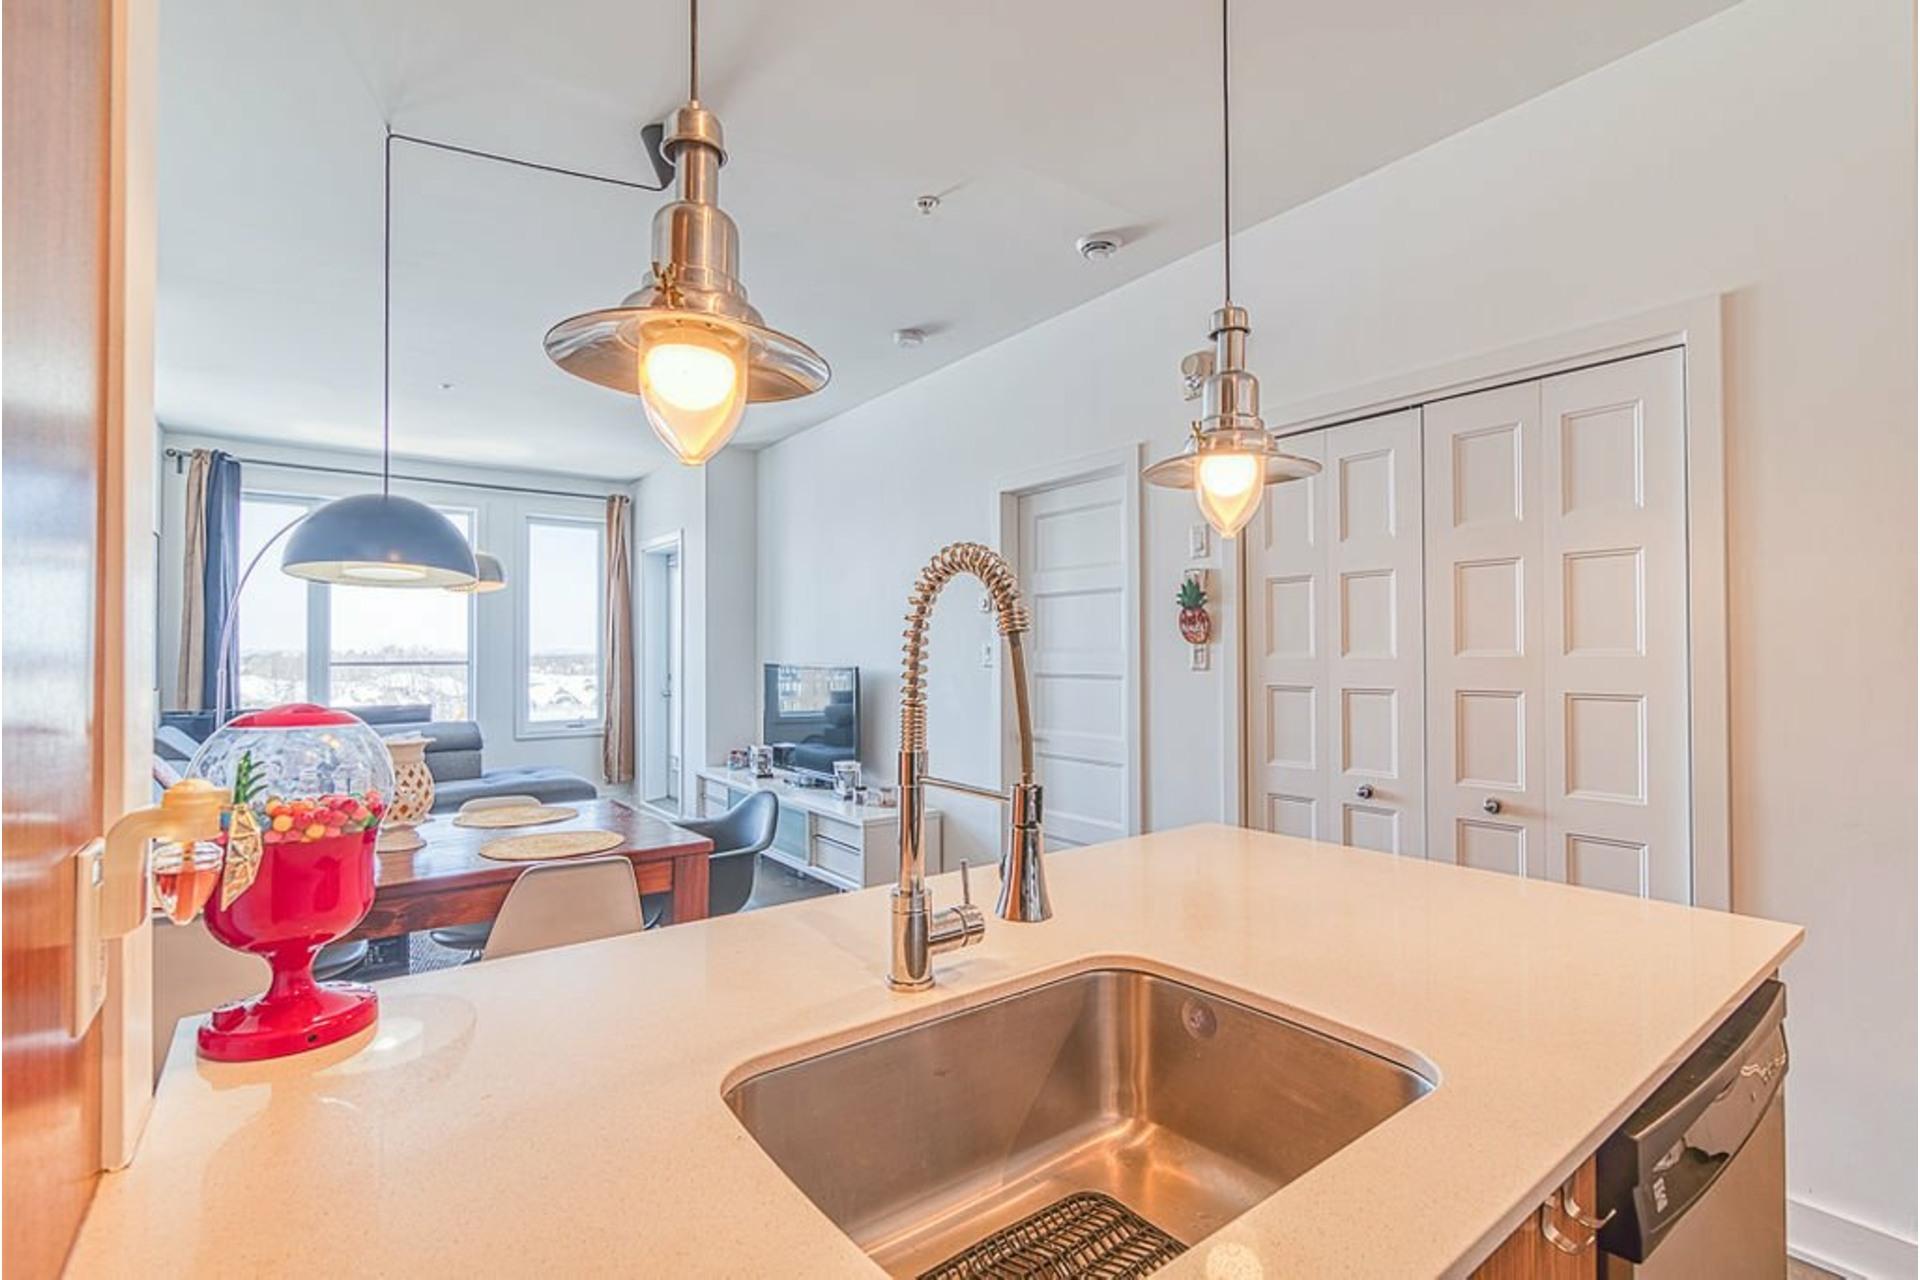 image 6 - Apartment For sale Blainville - 4 rooms